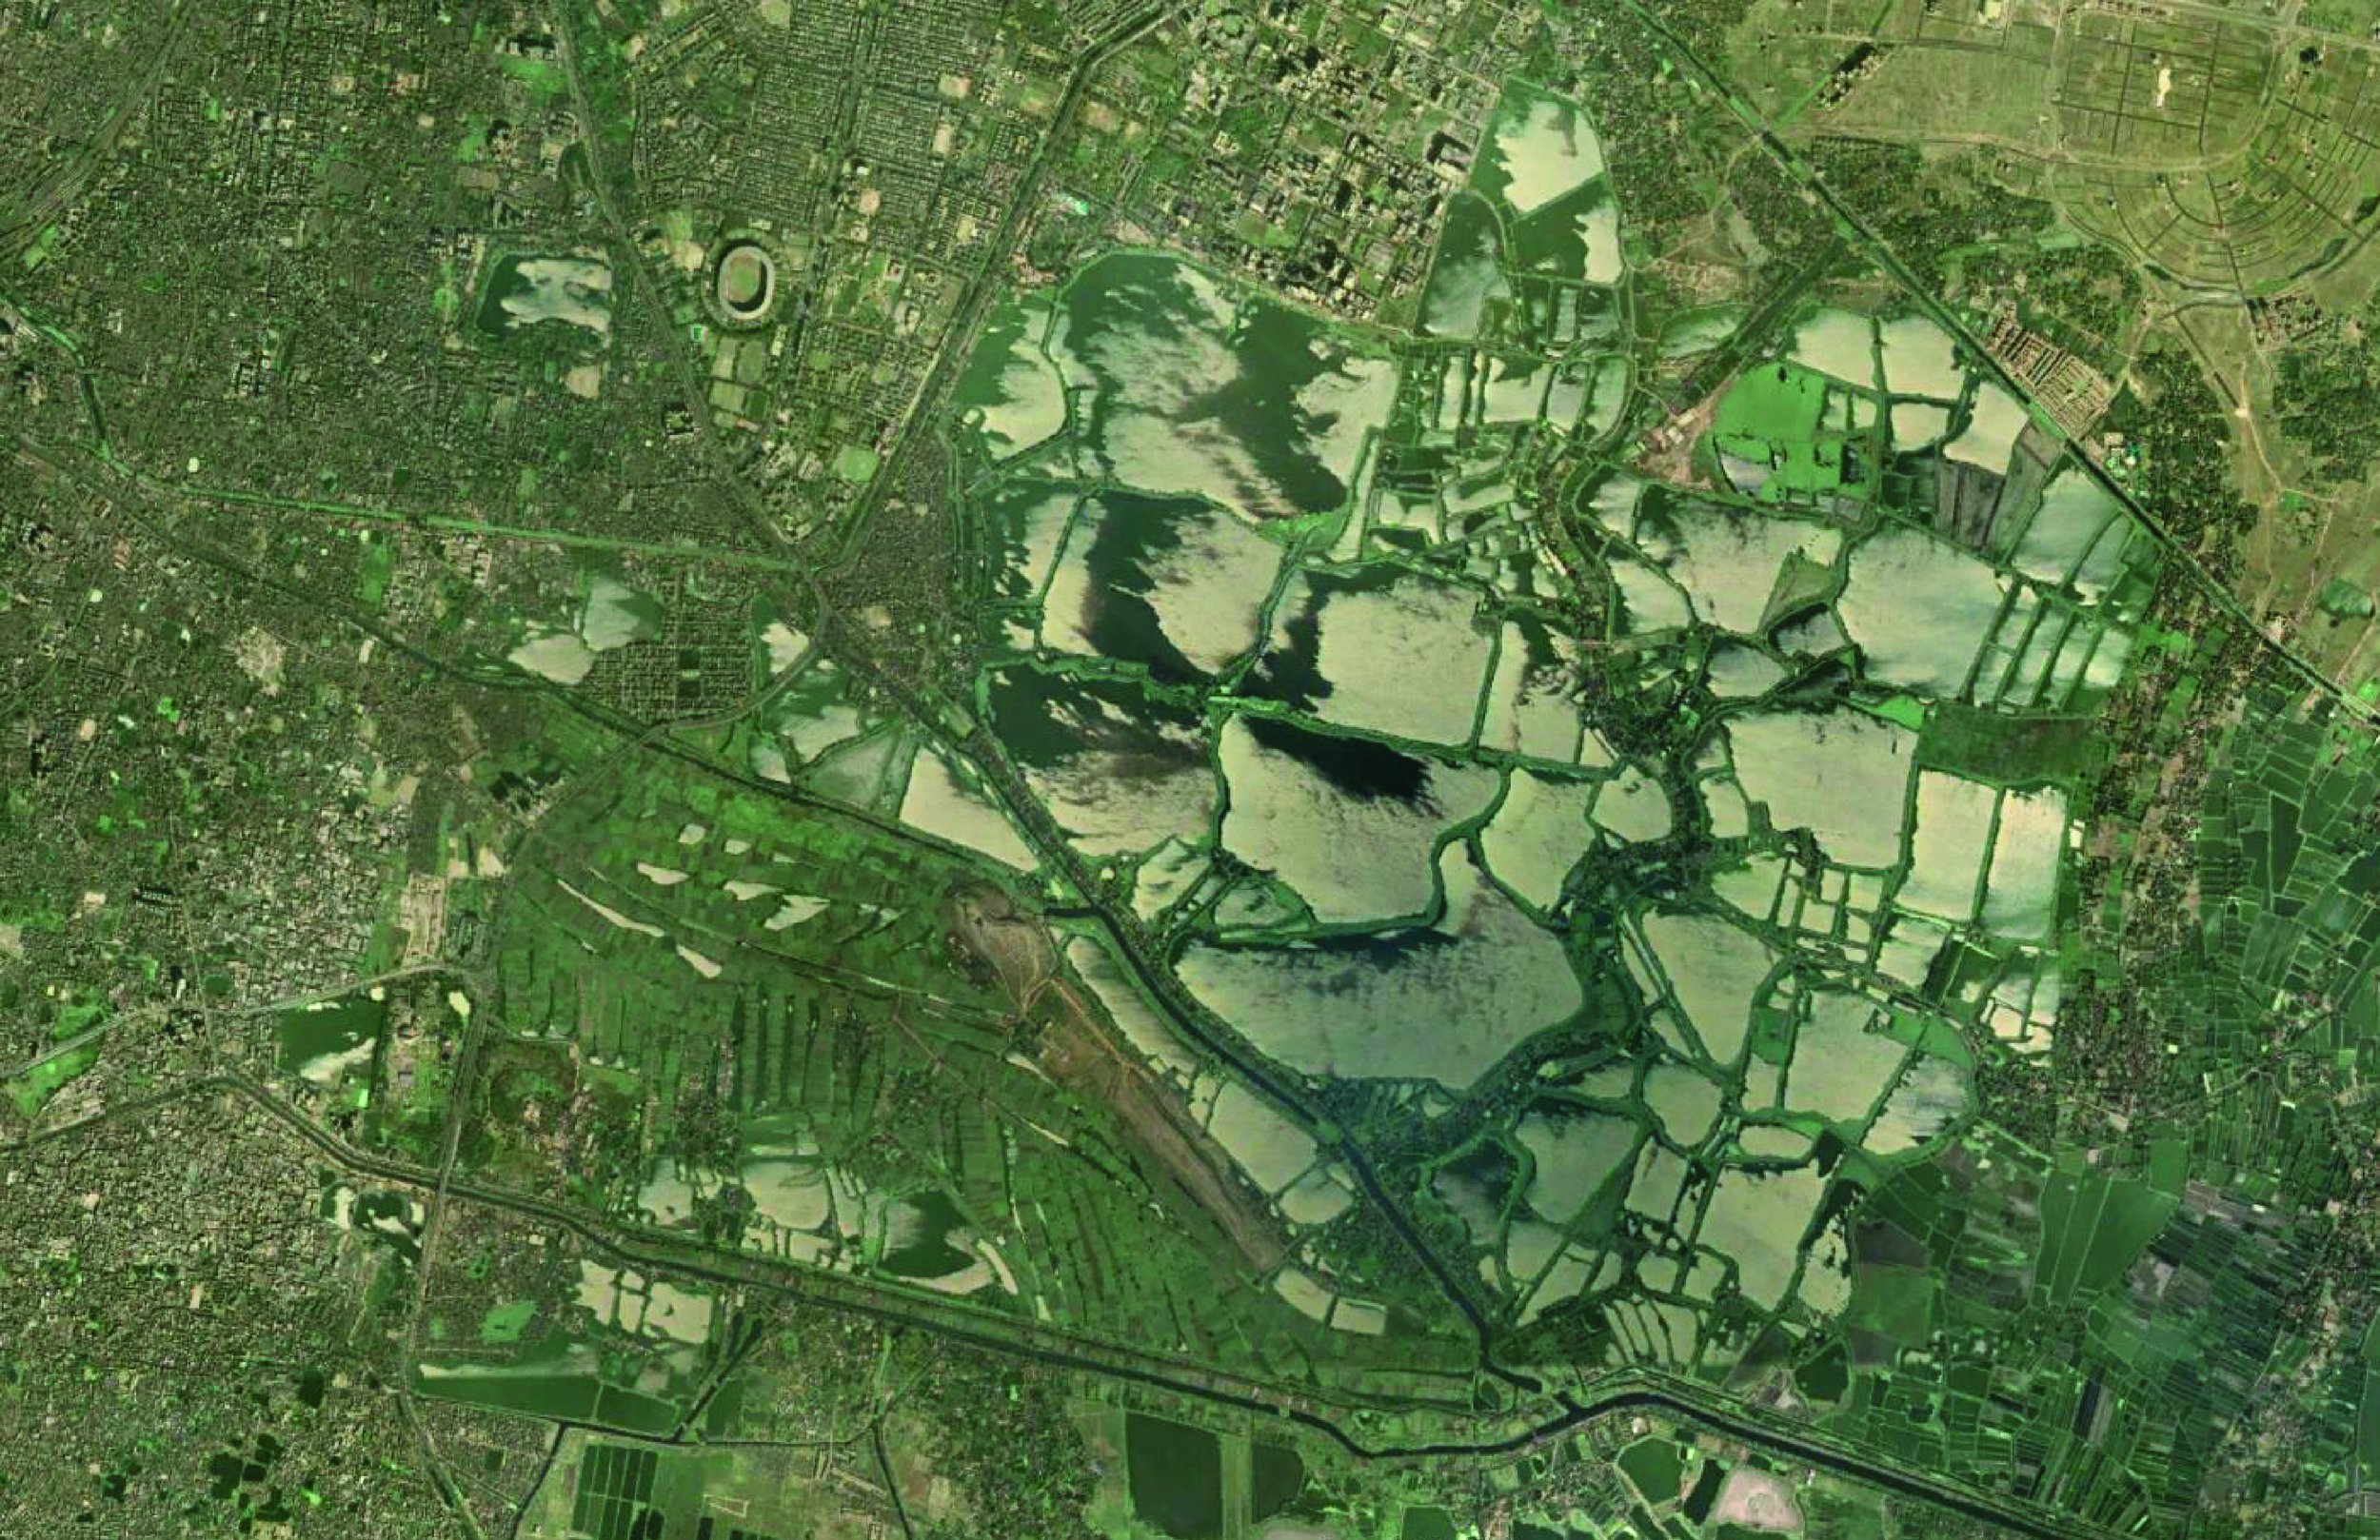 East Kolkata Wetlands in the process of draining for fertilizer harvest and maintenance of proper depth levels.